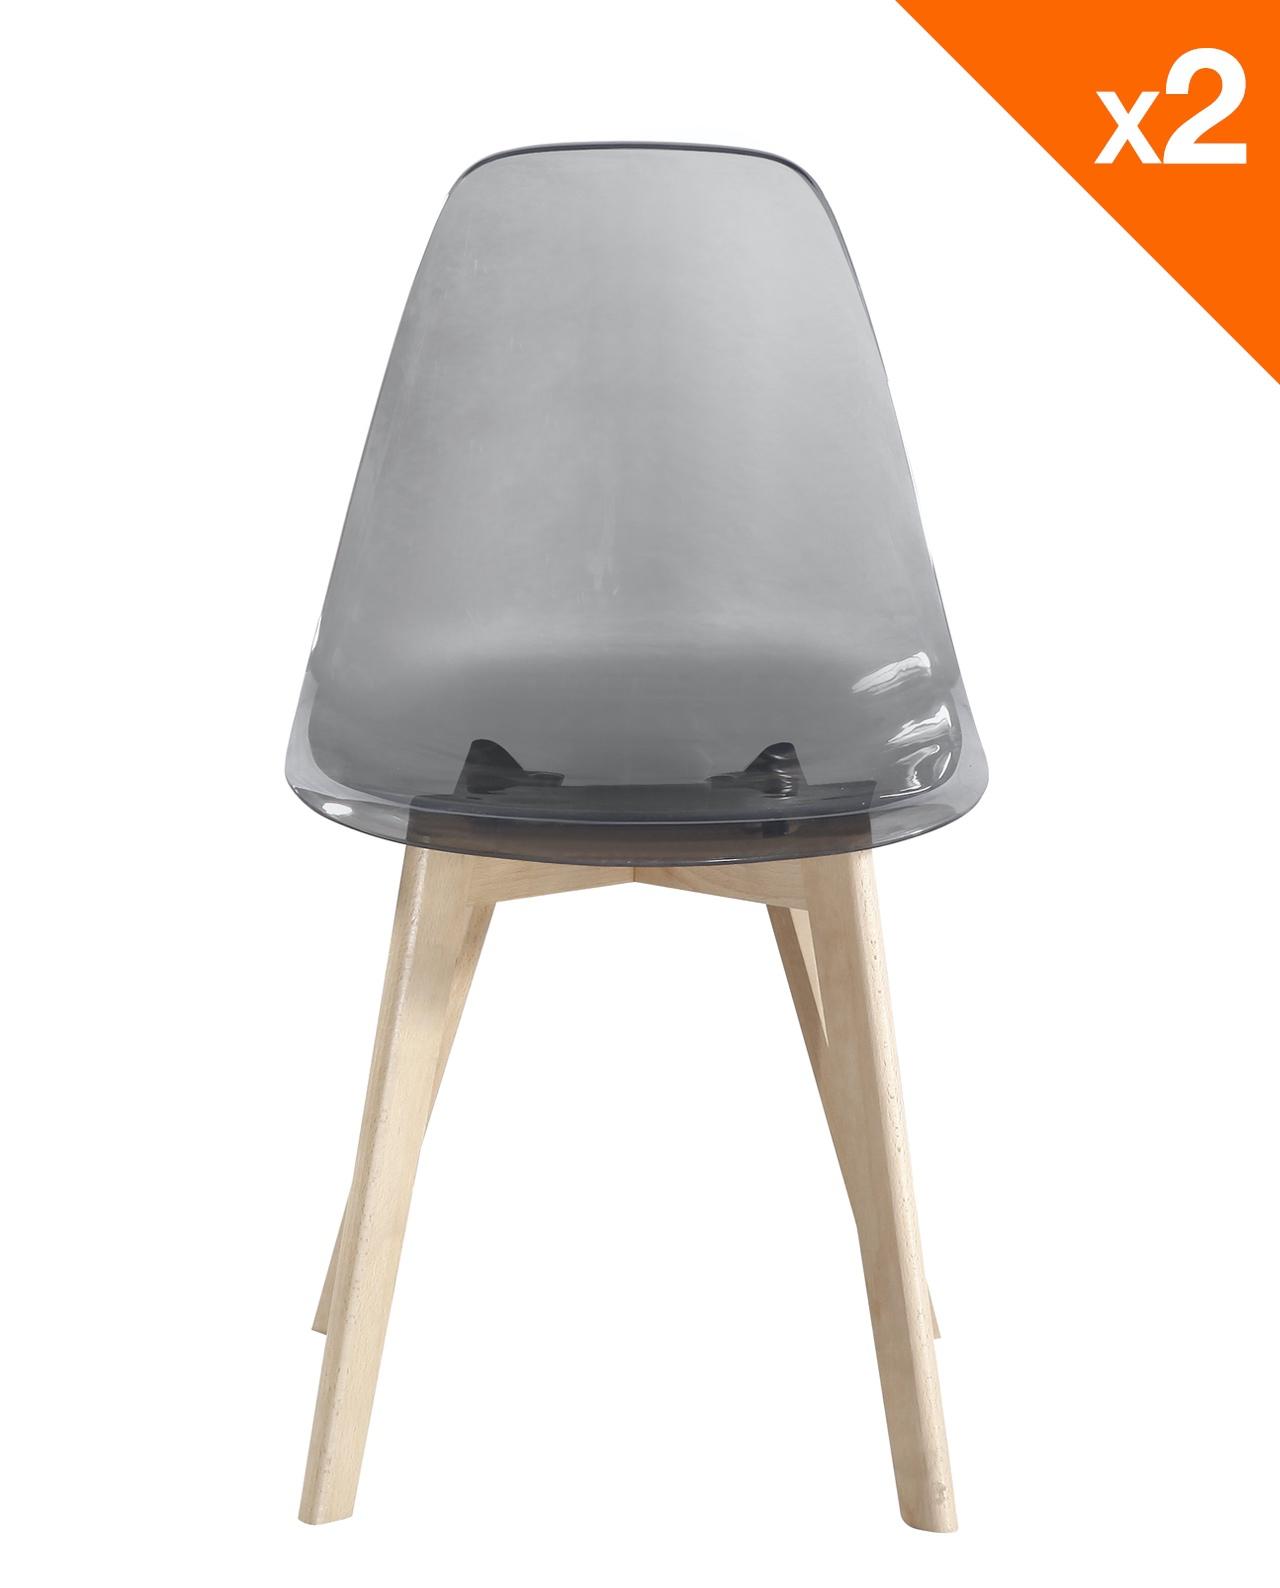 chaise scandinave design gris fum lao - Chaise Scandinave Design